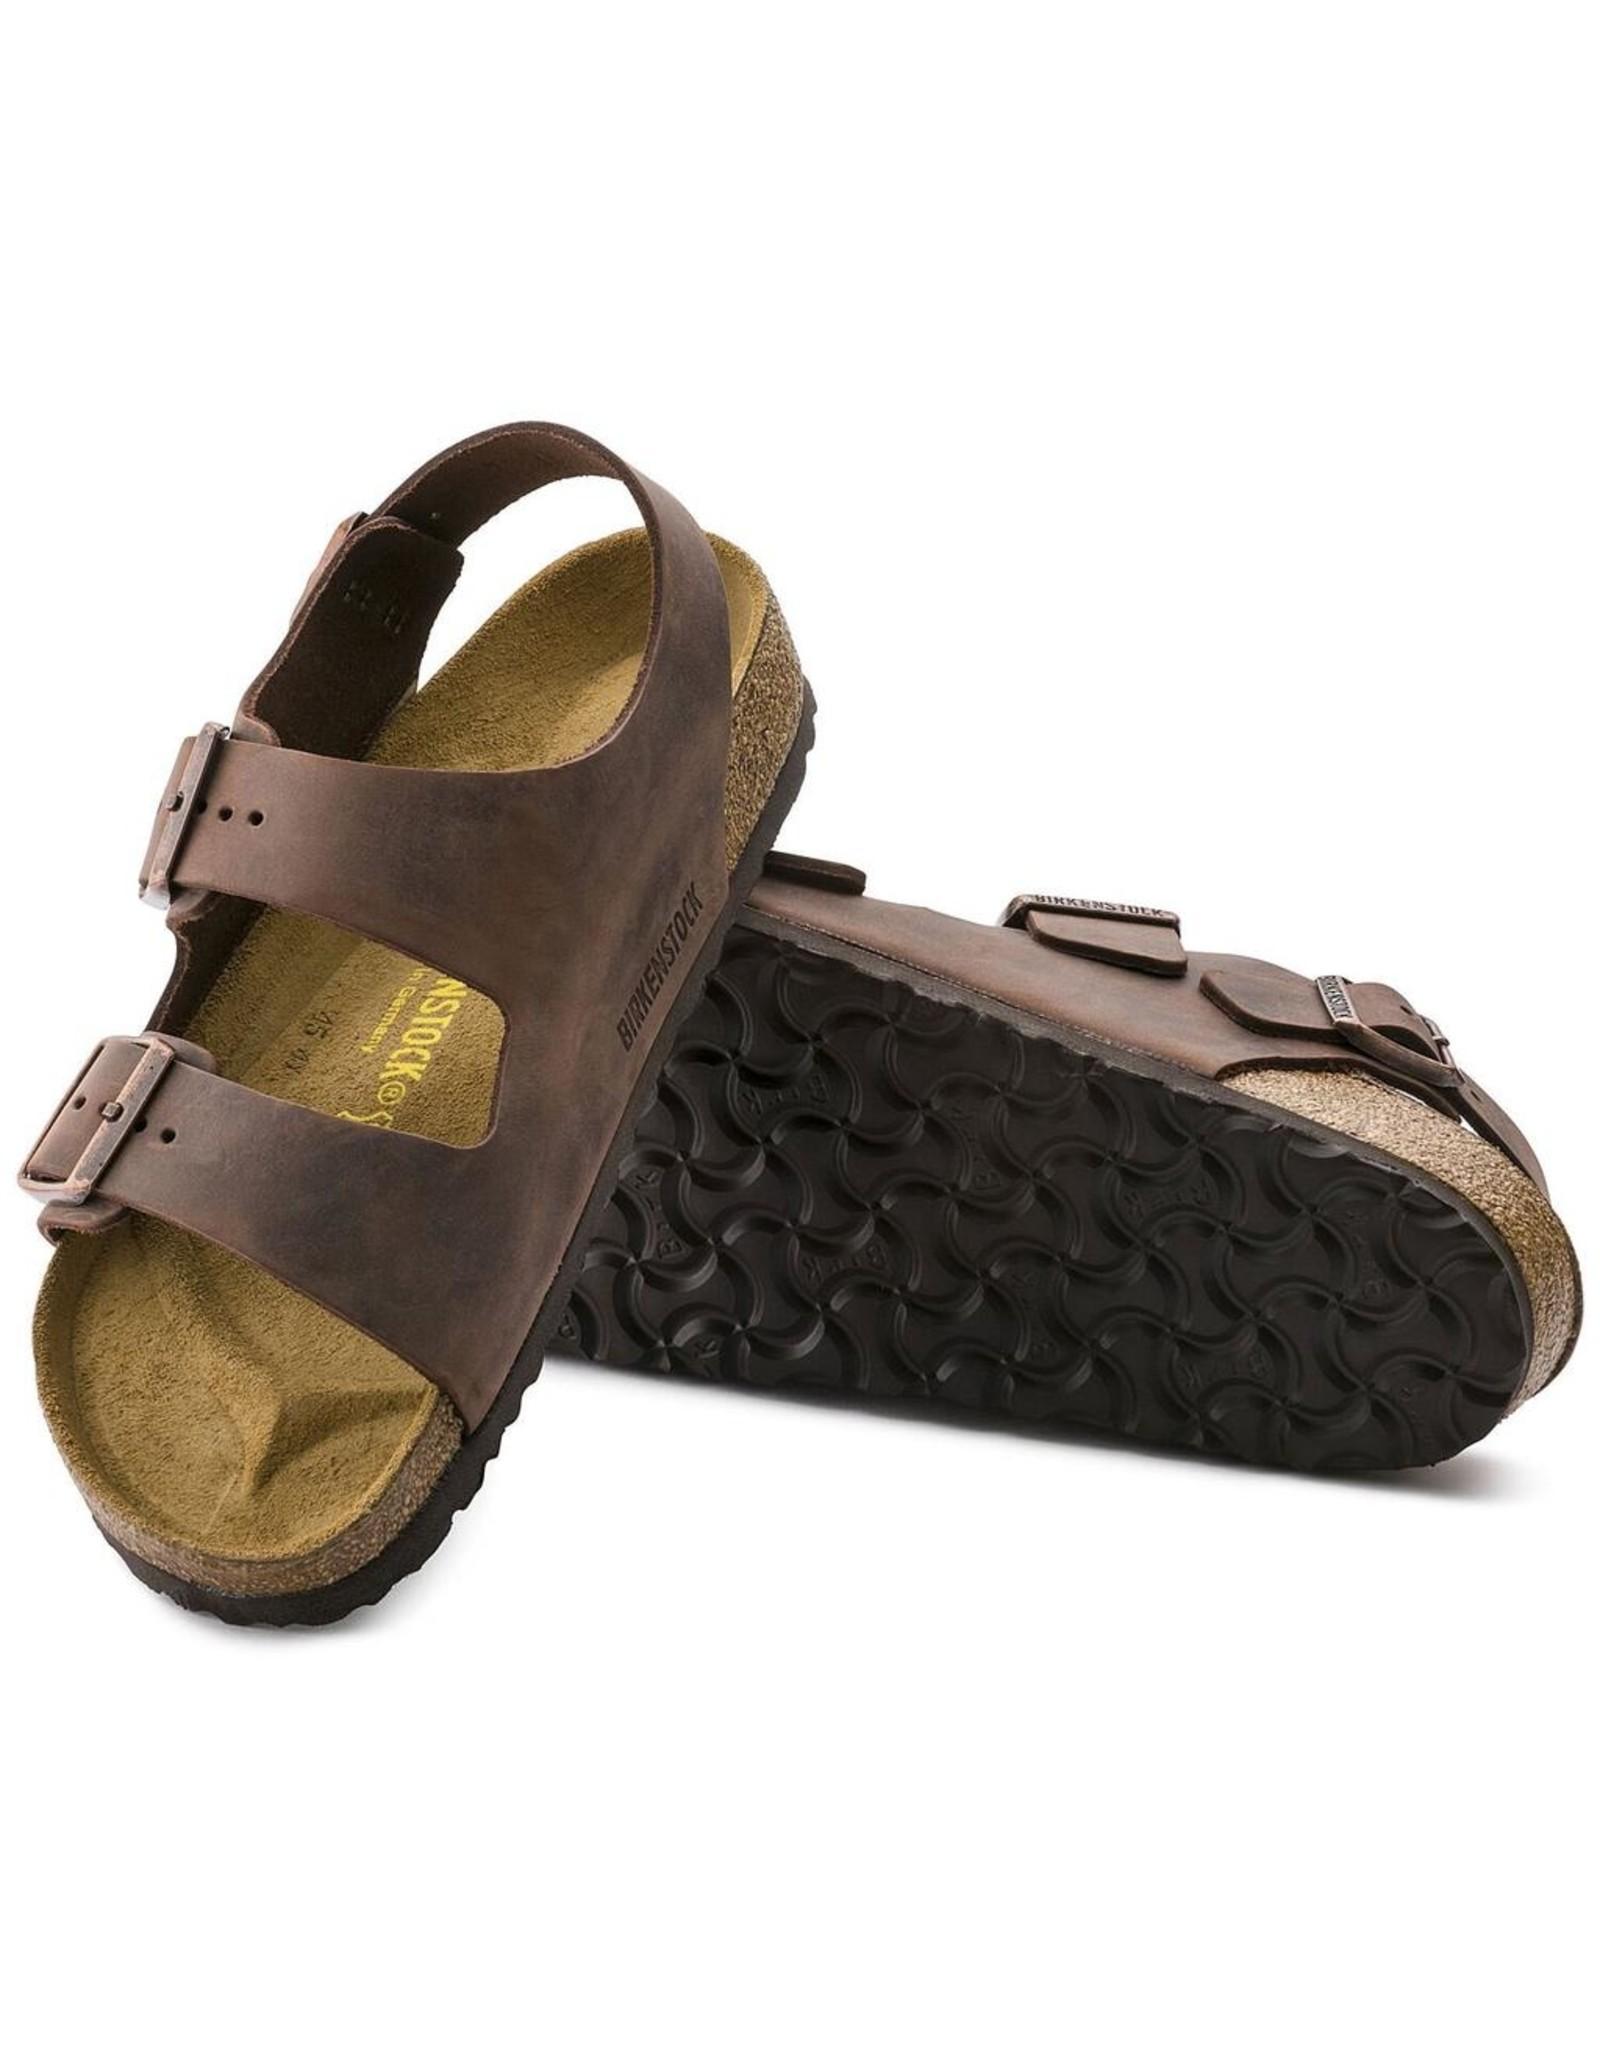 Birkenstock Milano Habana Oiled Leather Sandal